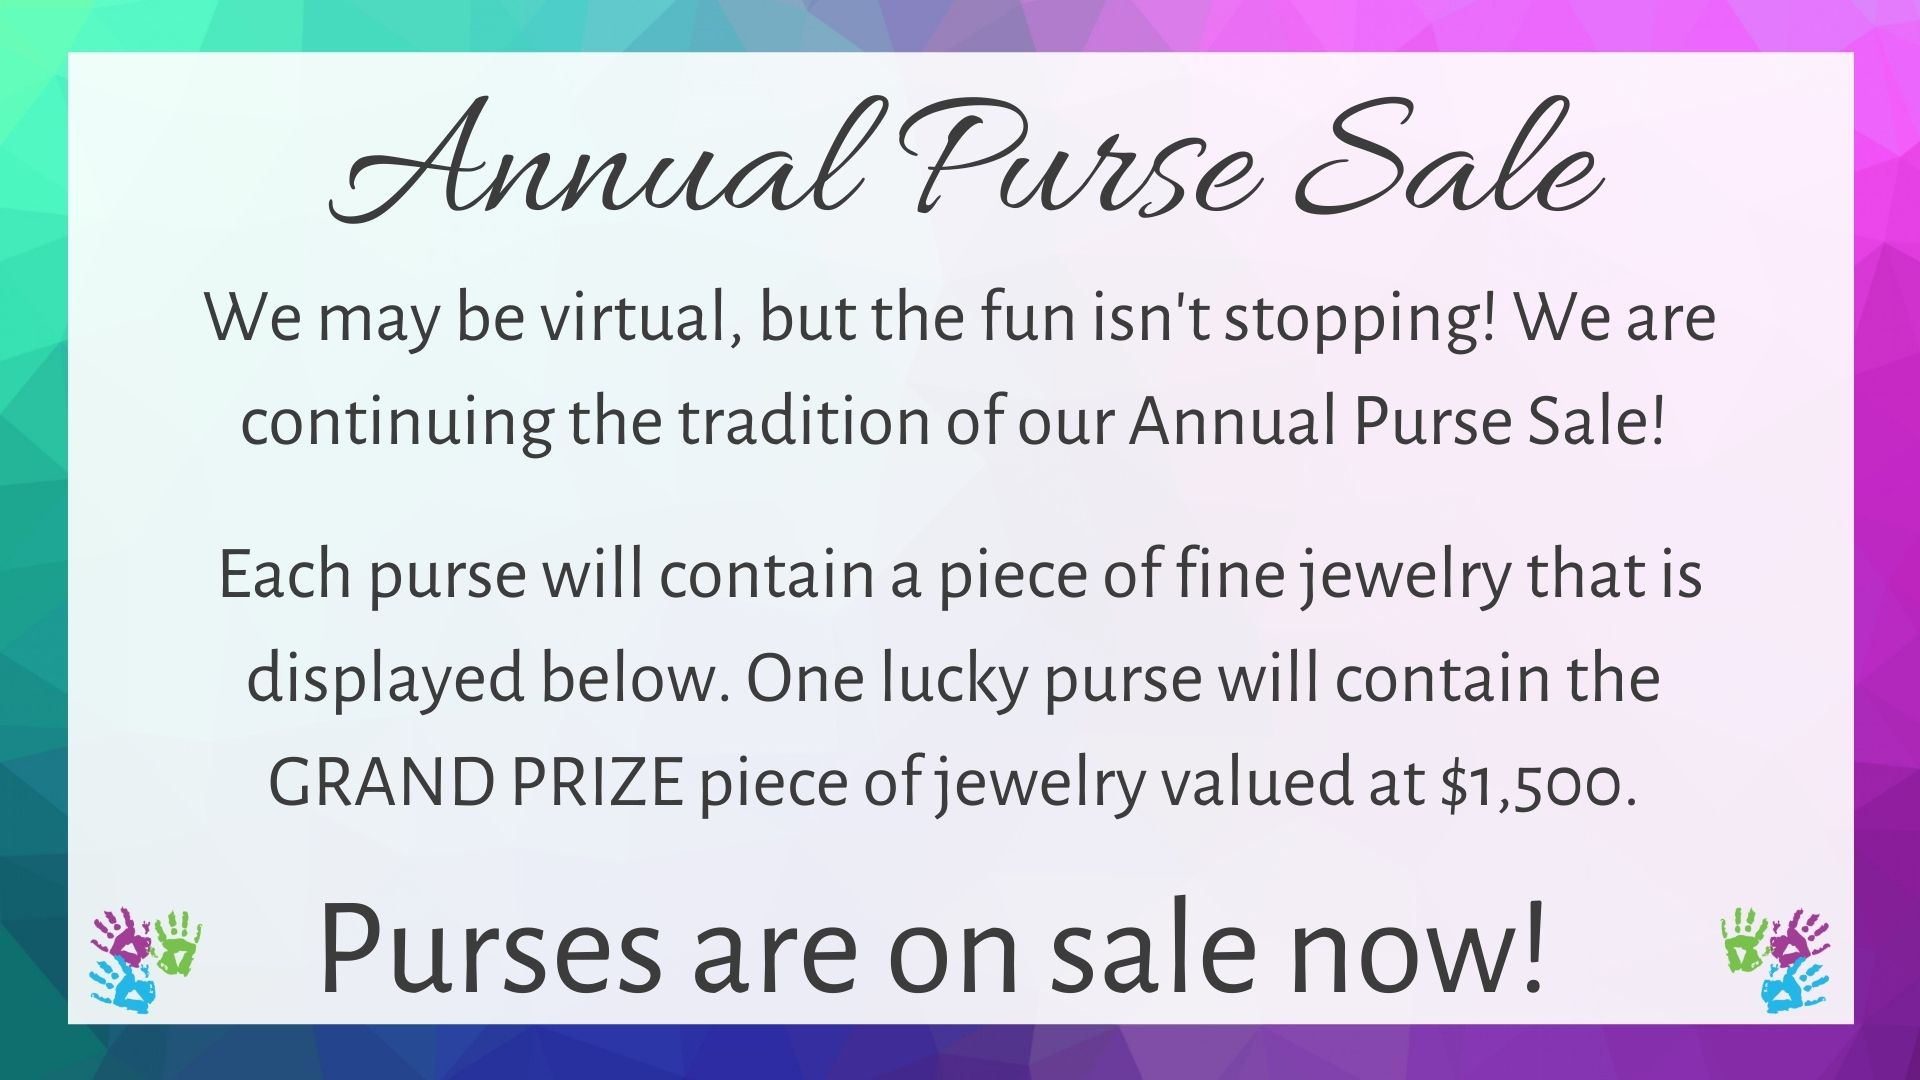 Annual Purse Sale